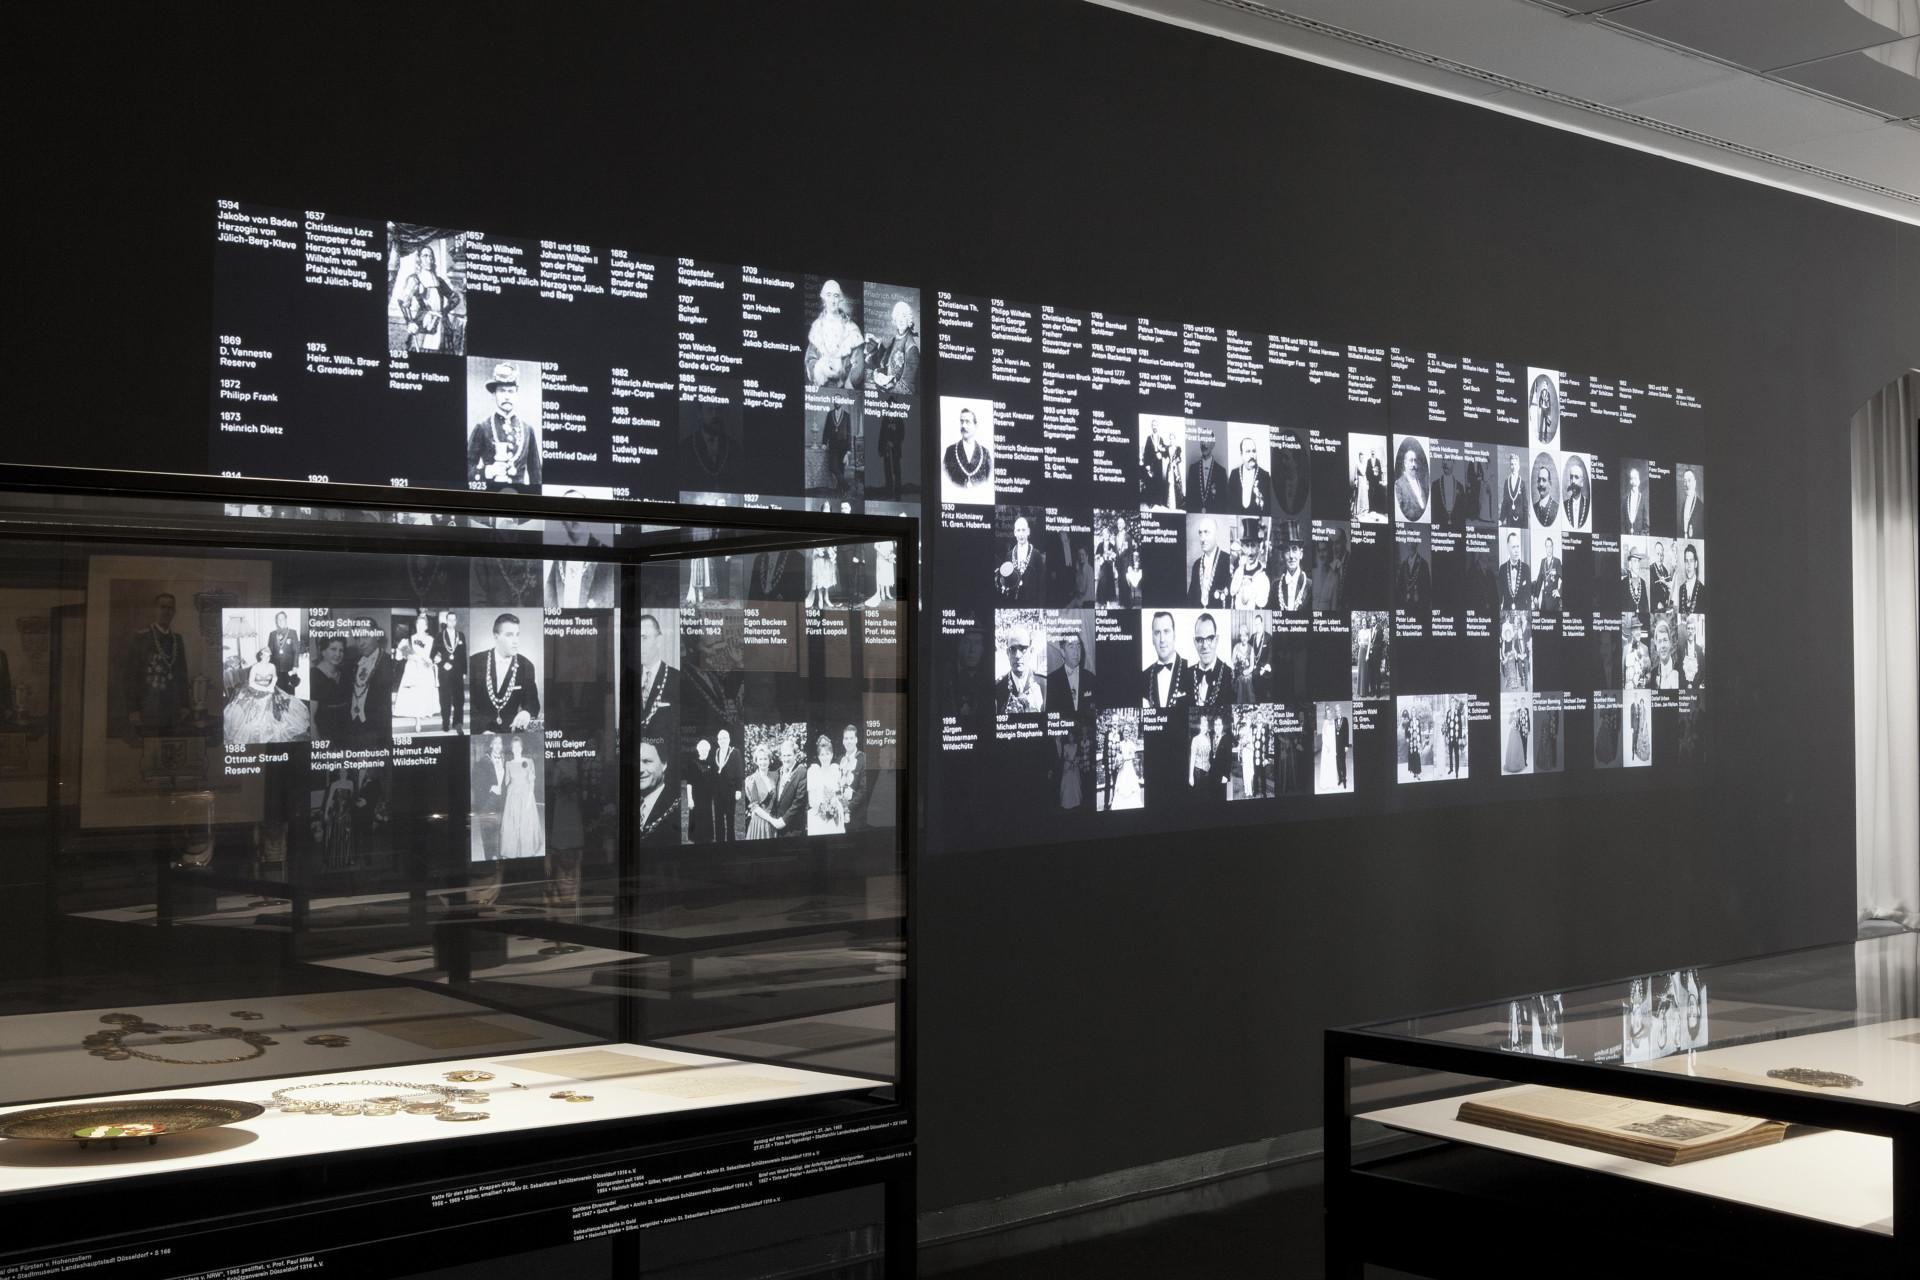 ANNEKE DUNKHASE Fotografie Dortmund Ausstellungsfotografie St.Sebastianus im Stadtmuseum Düsseldorf